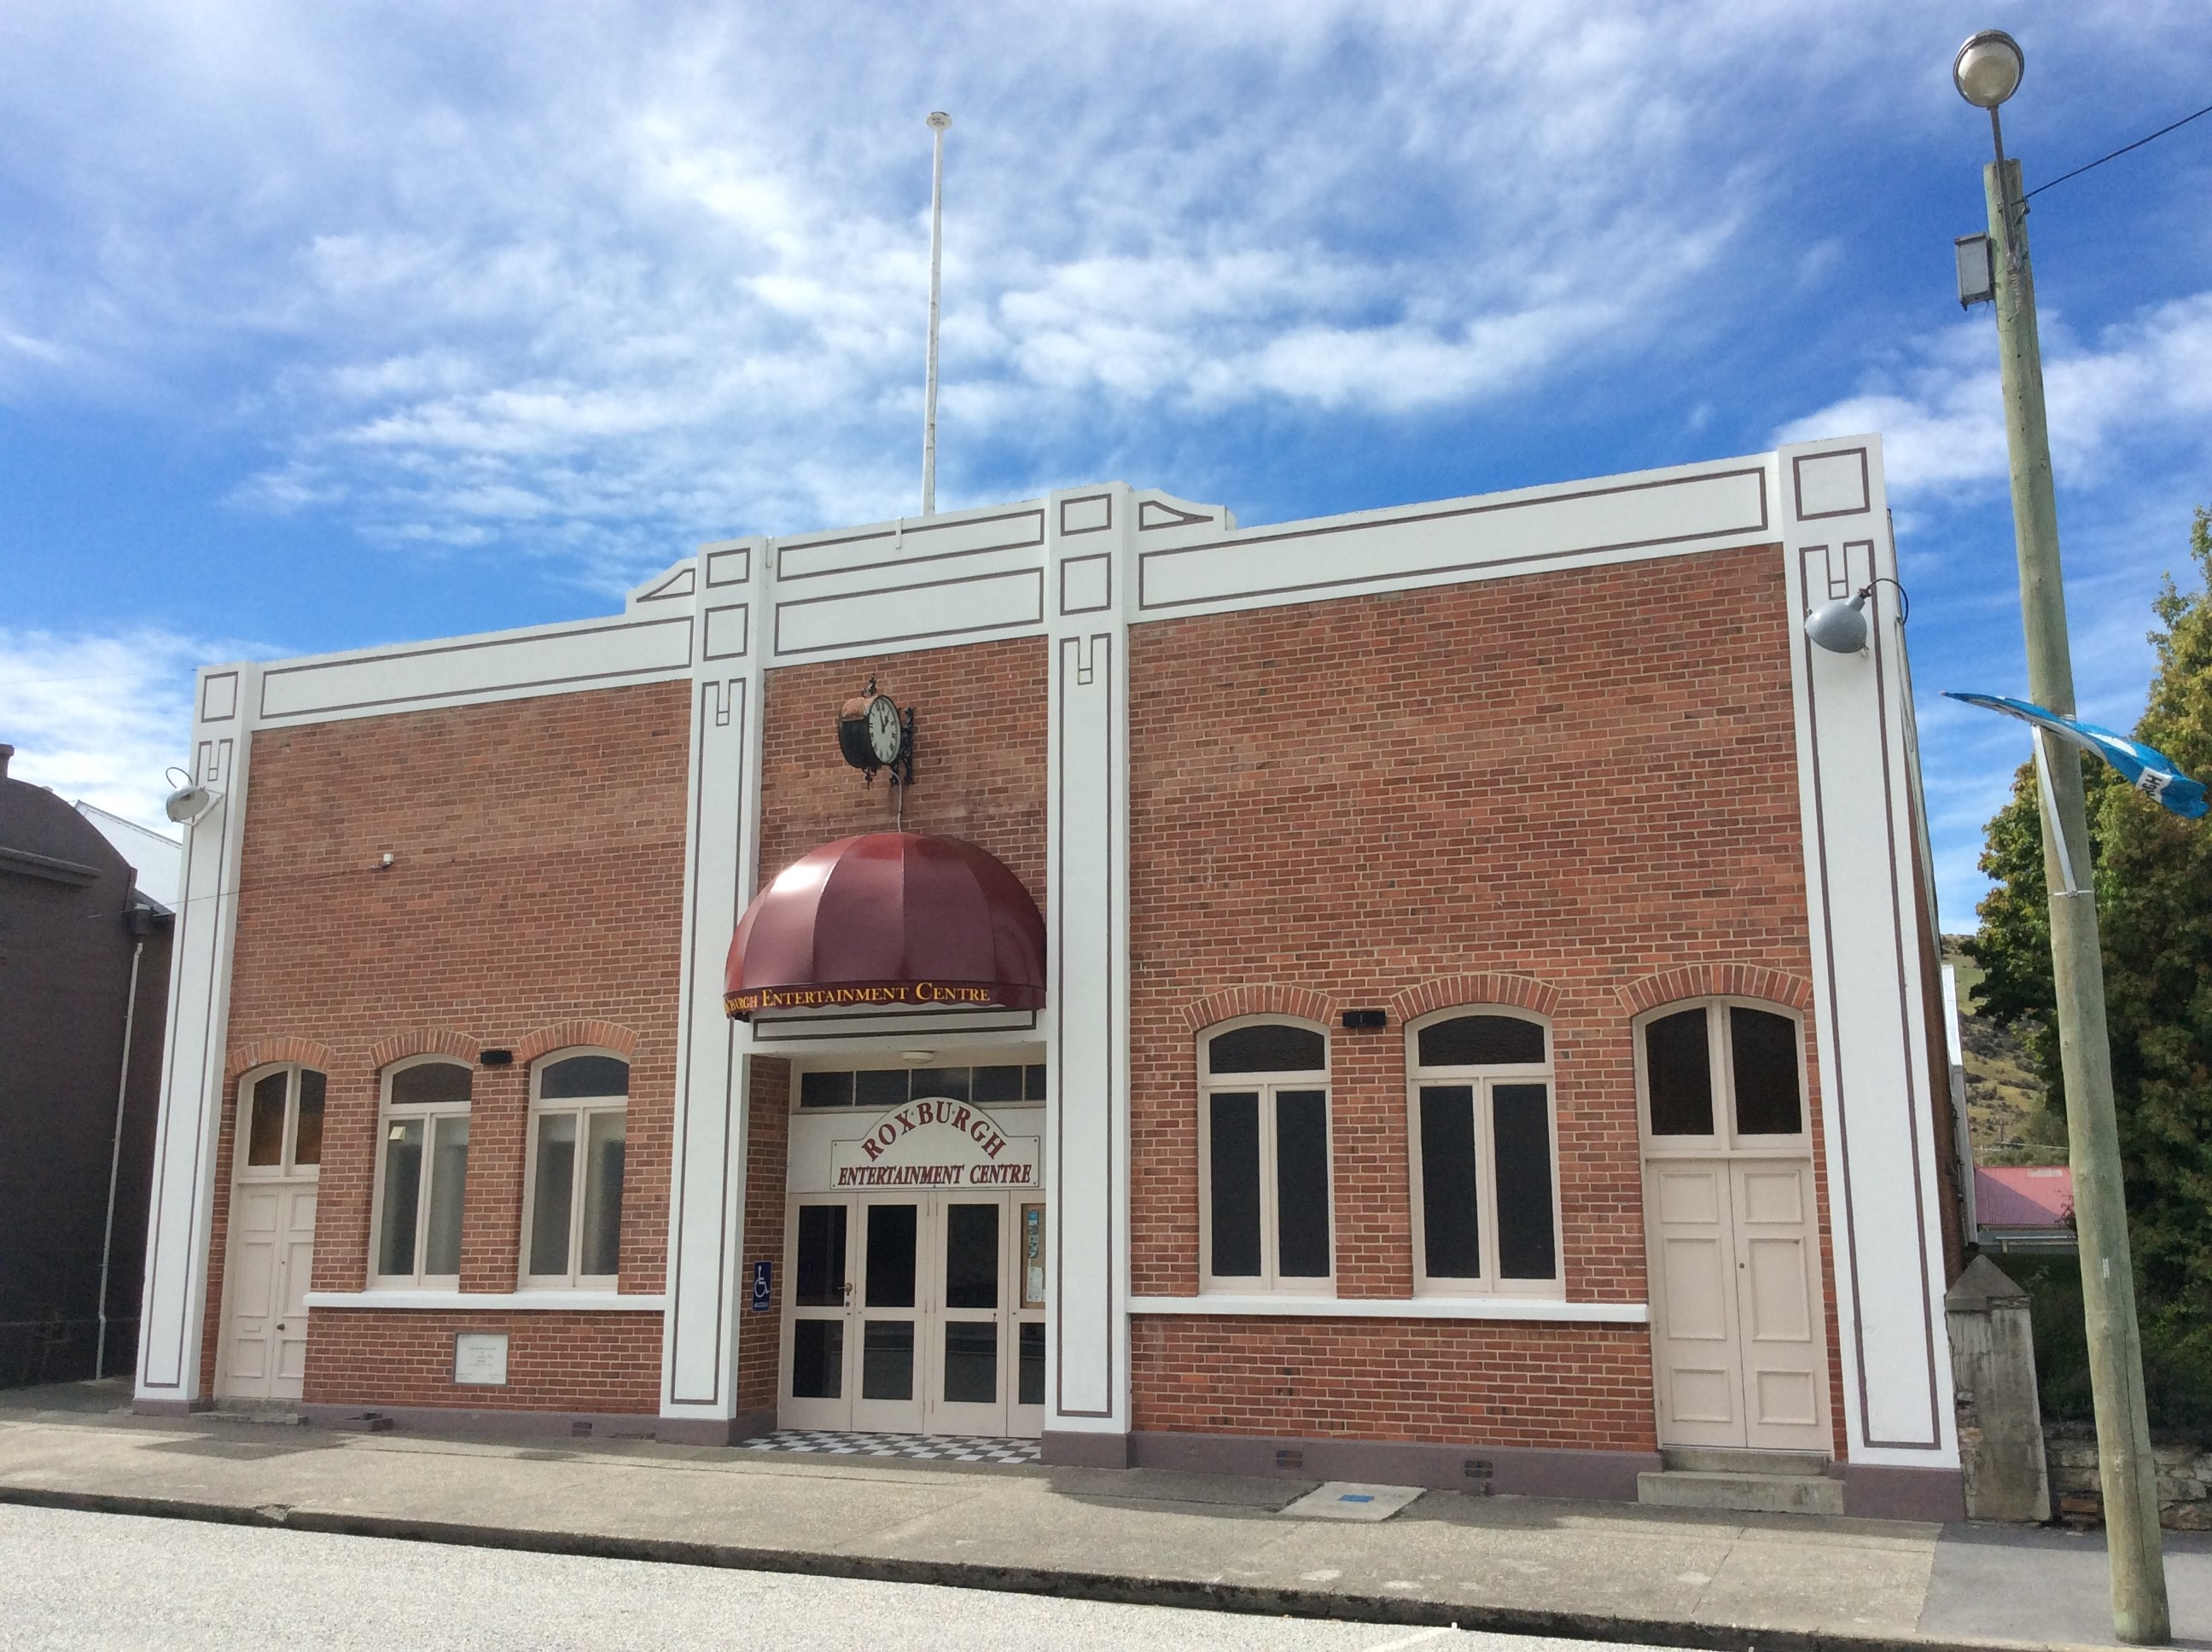 Roxburgh Entertainment Centre